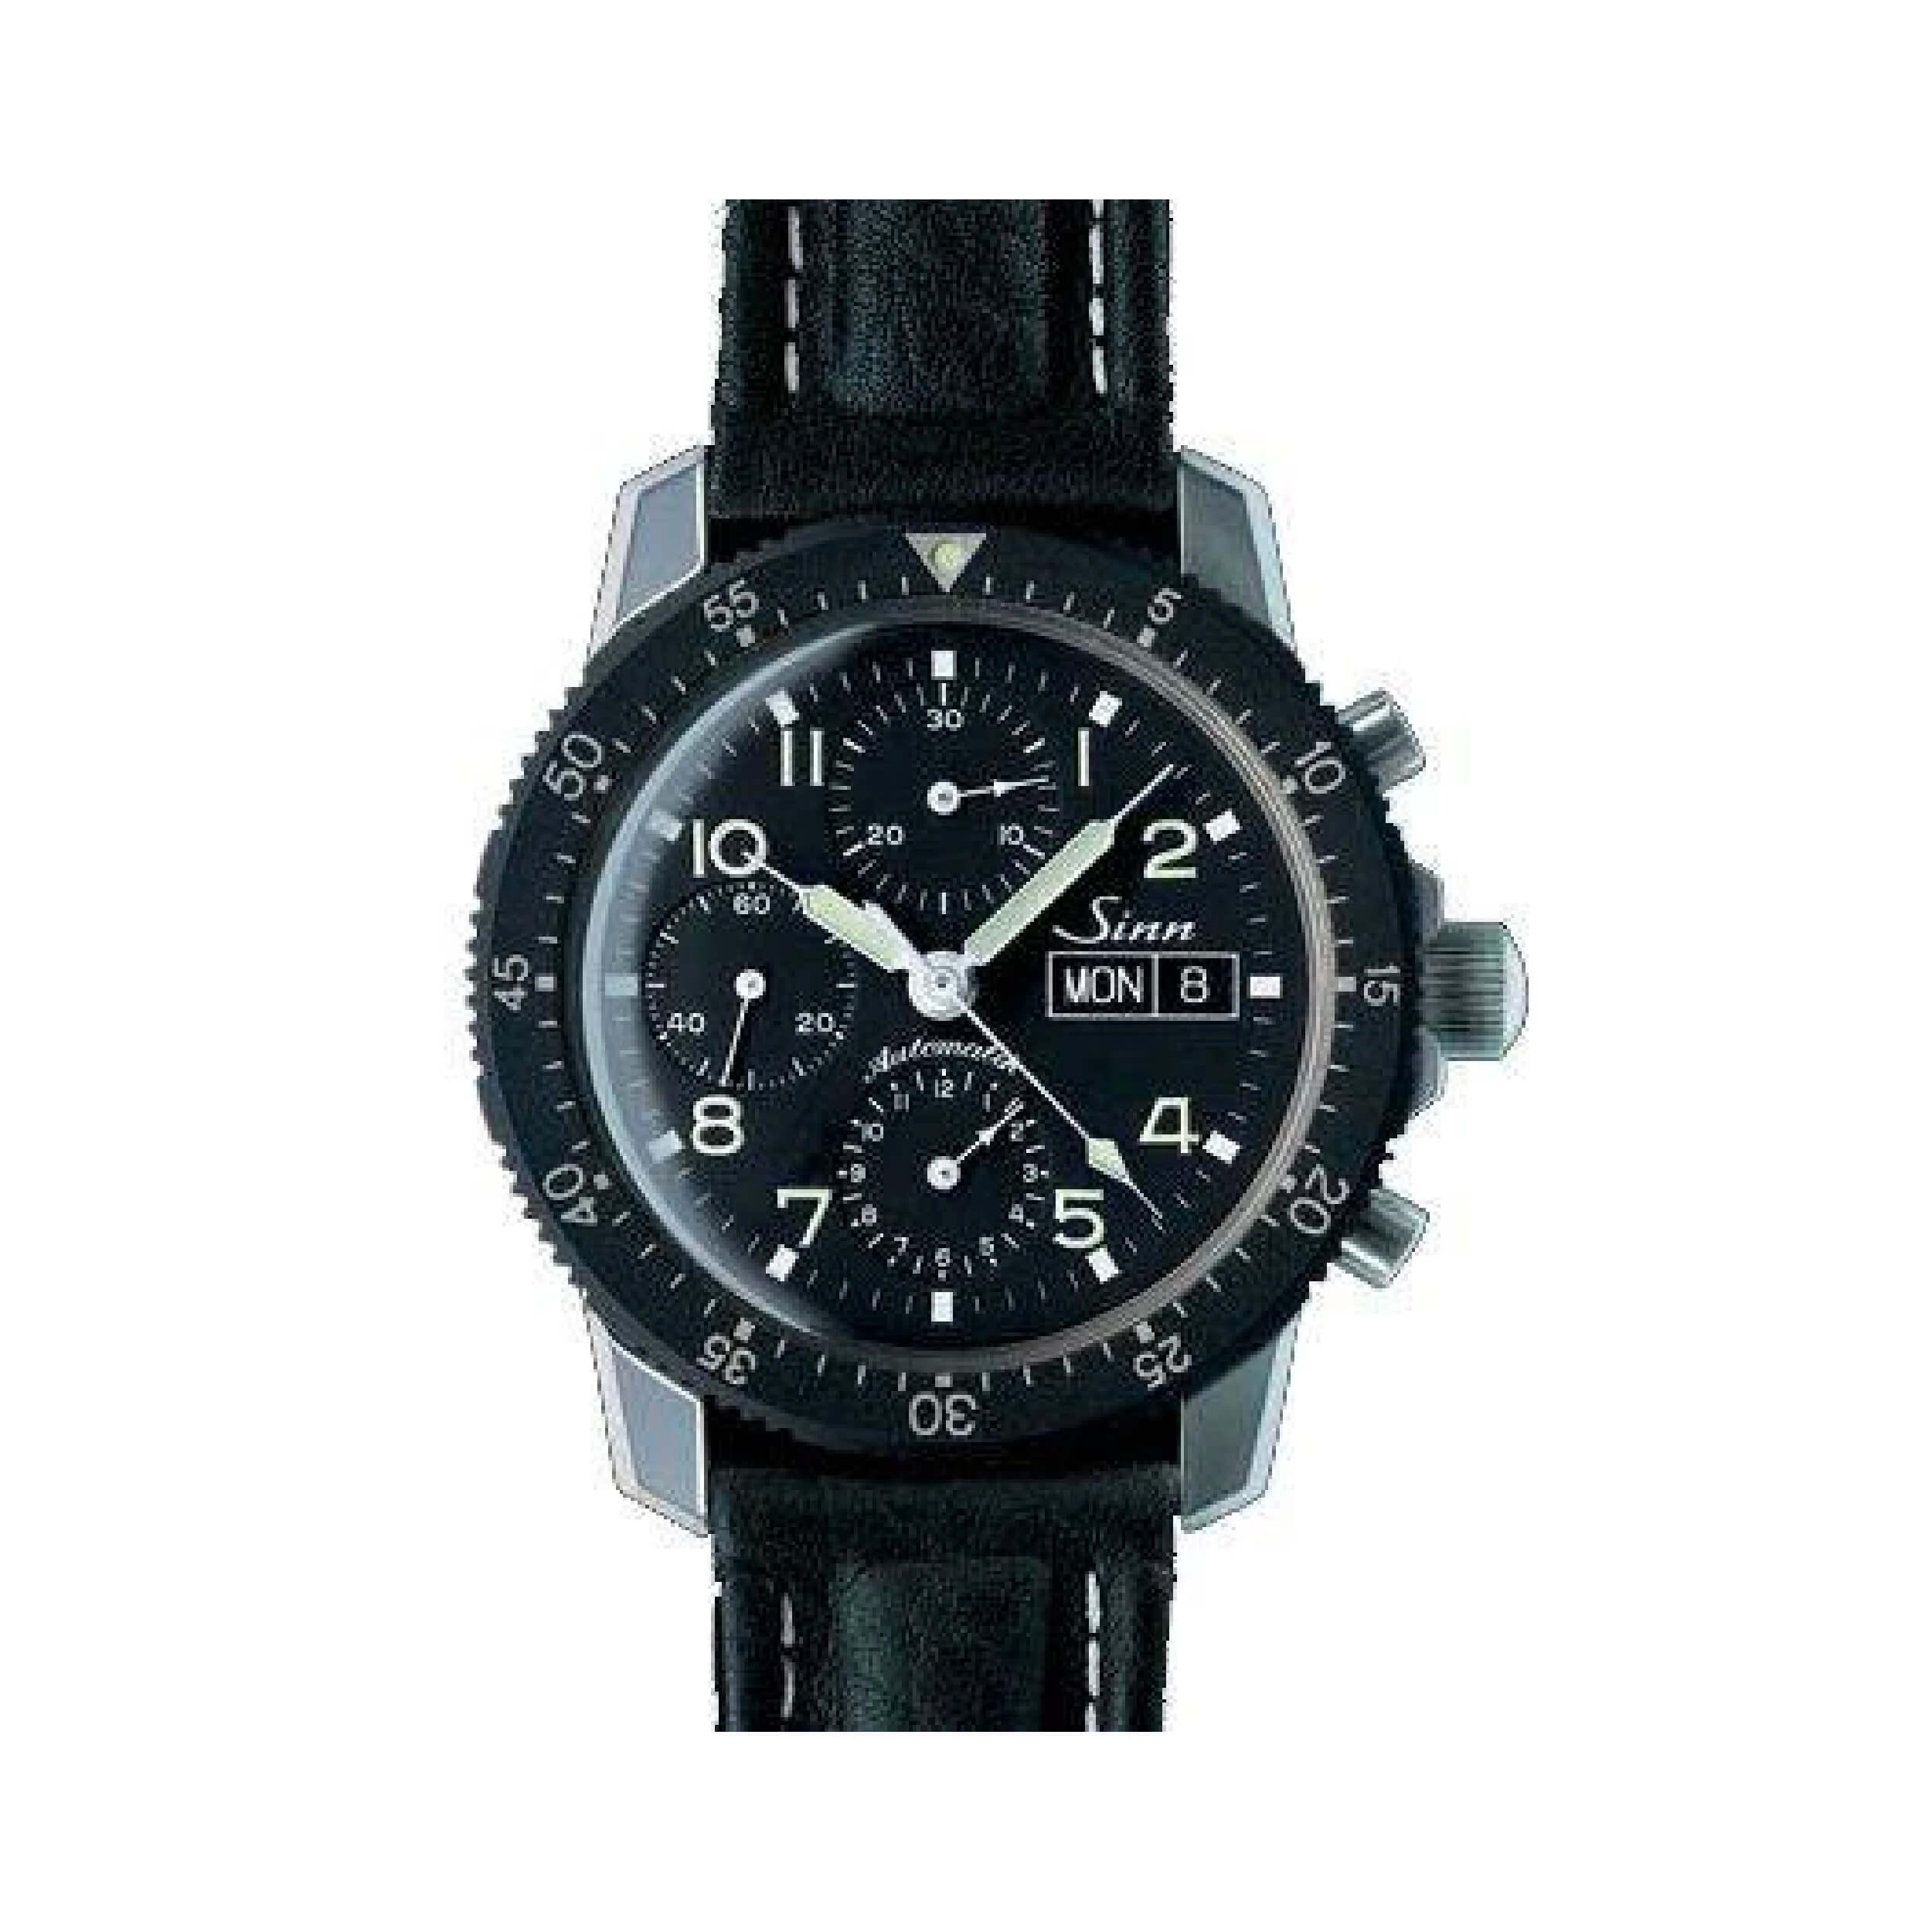 Sinn Flieger Chronograph 103 St | Best Chronograph Watches Under 2000